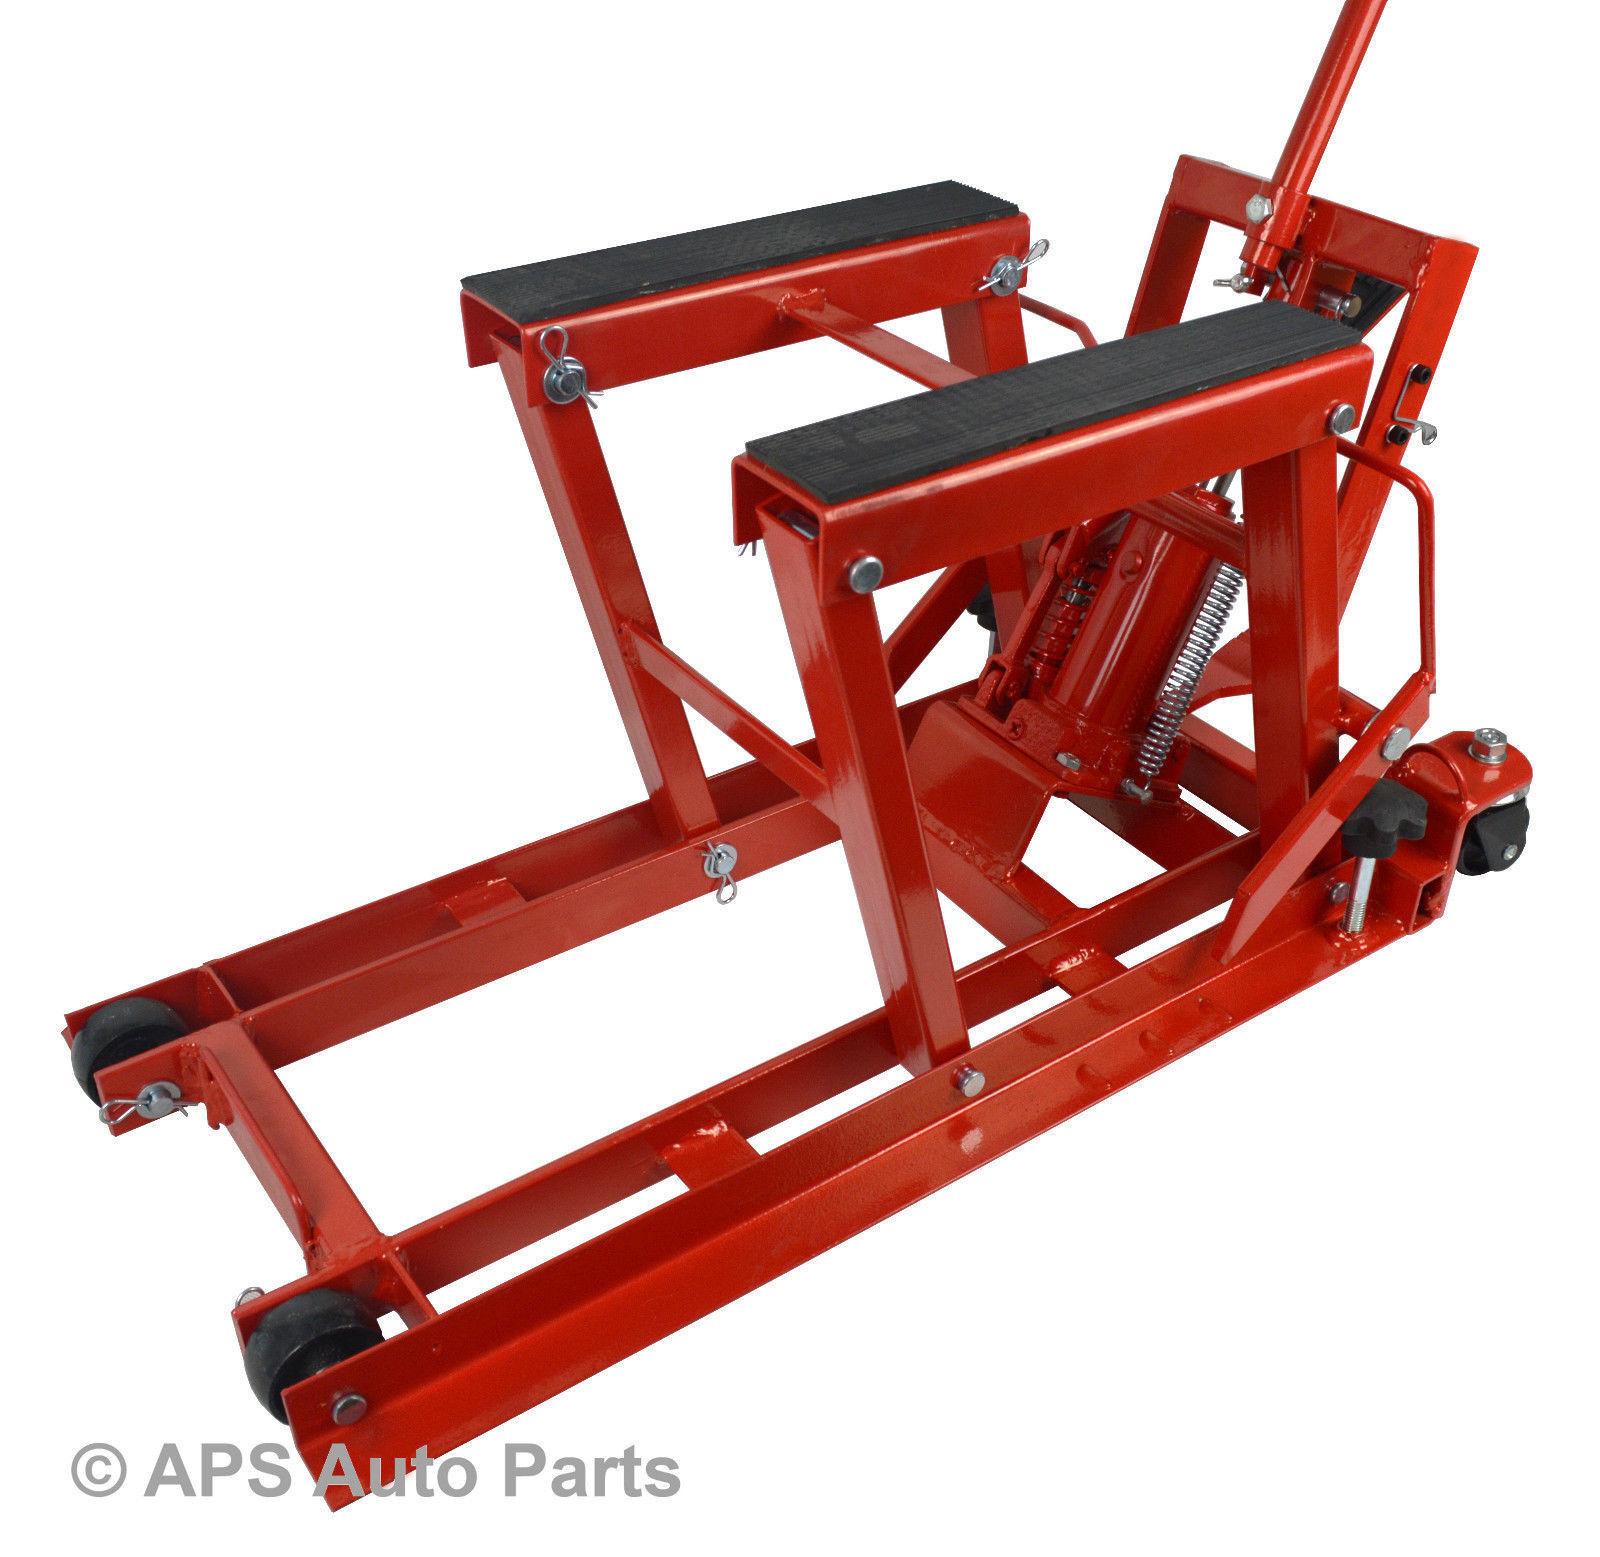 Hydraulic Lift Accessories : Lb hydraulic motorcycle bike lift motorbike atv quad